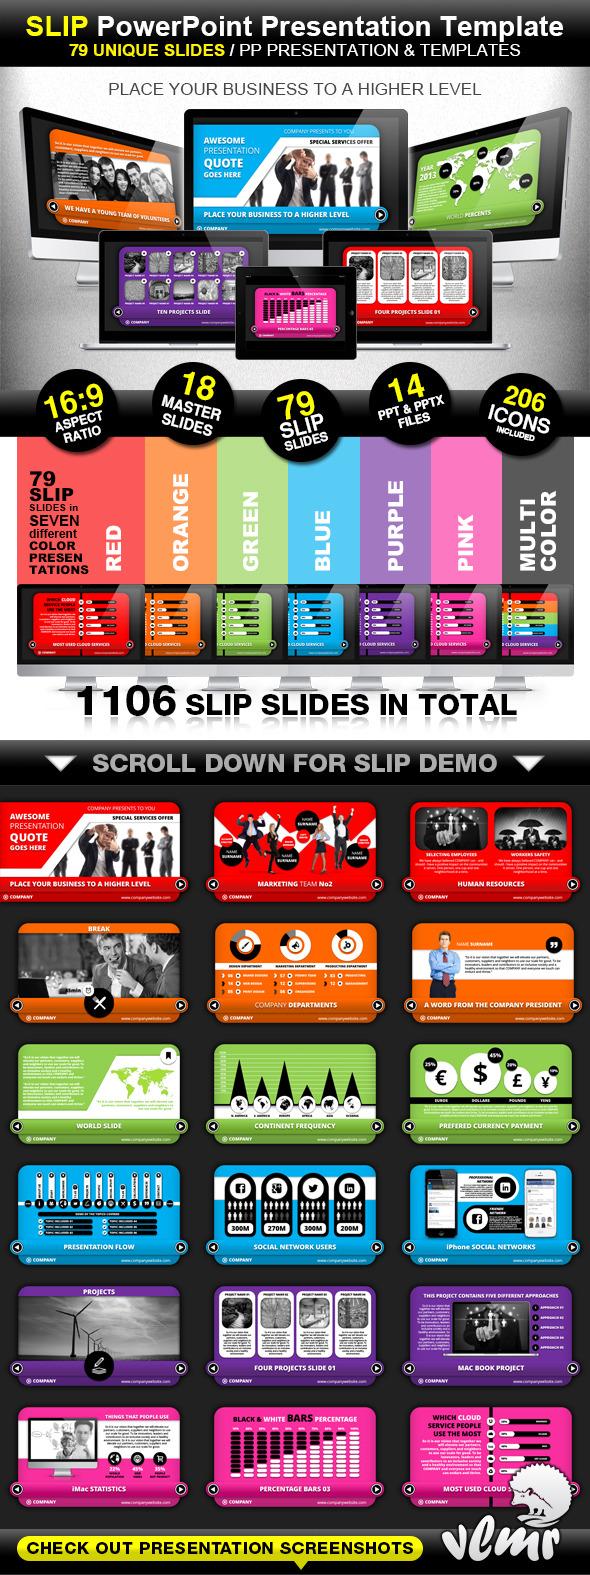 Slip Company PowerPoint Presentation Template